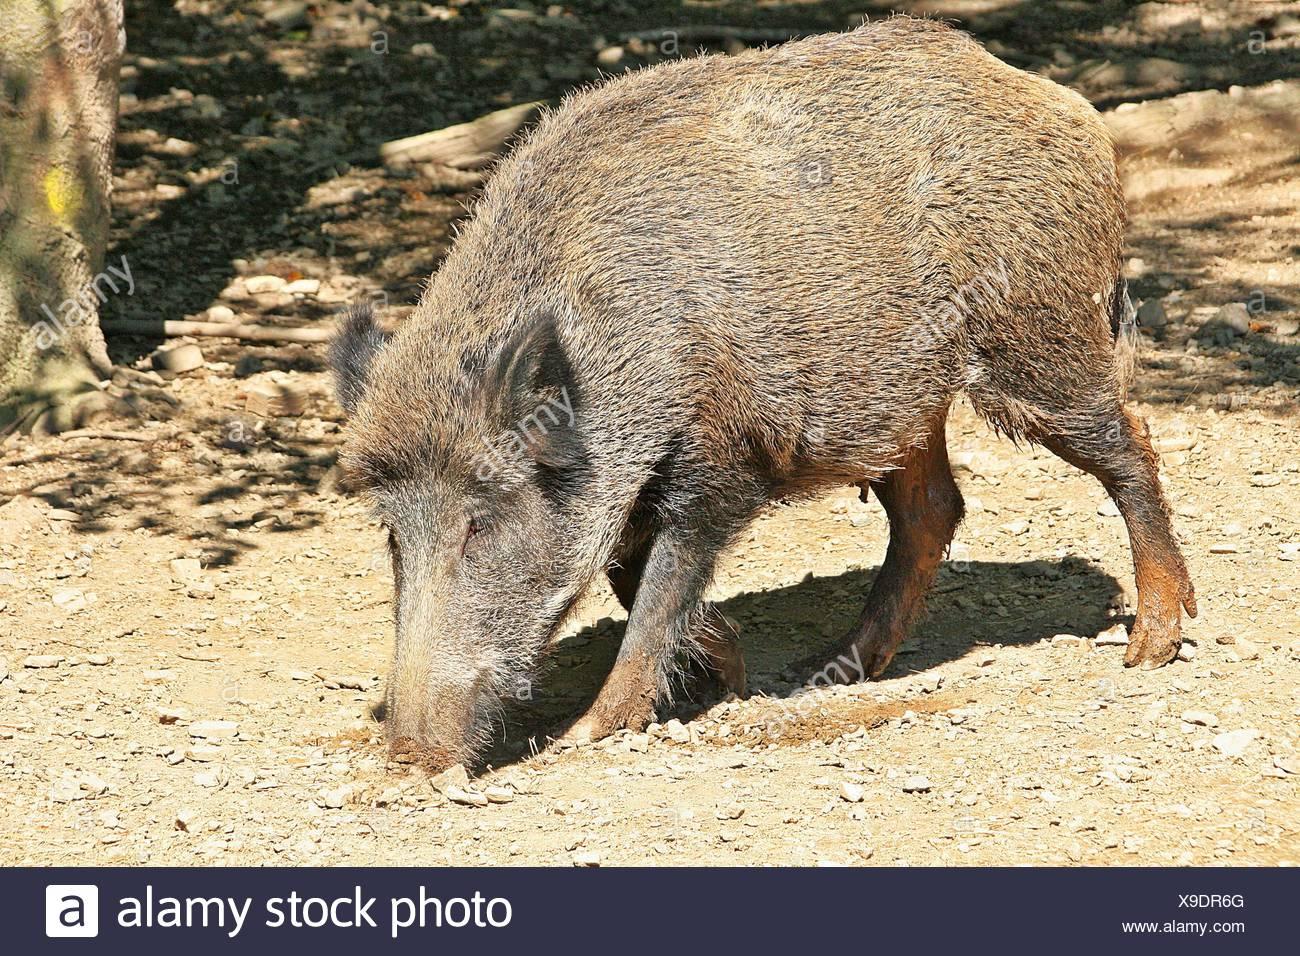 wild pork - Stock Image